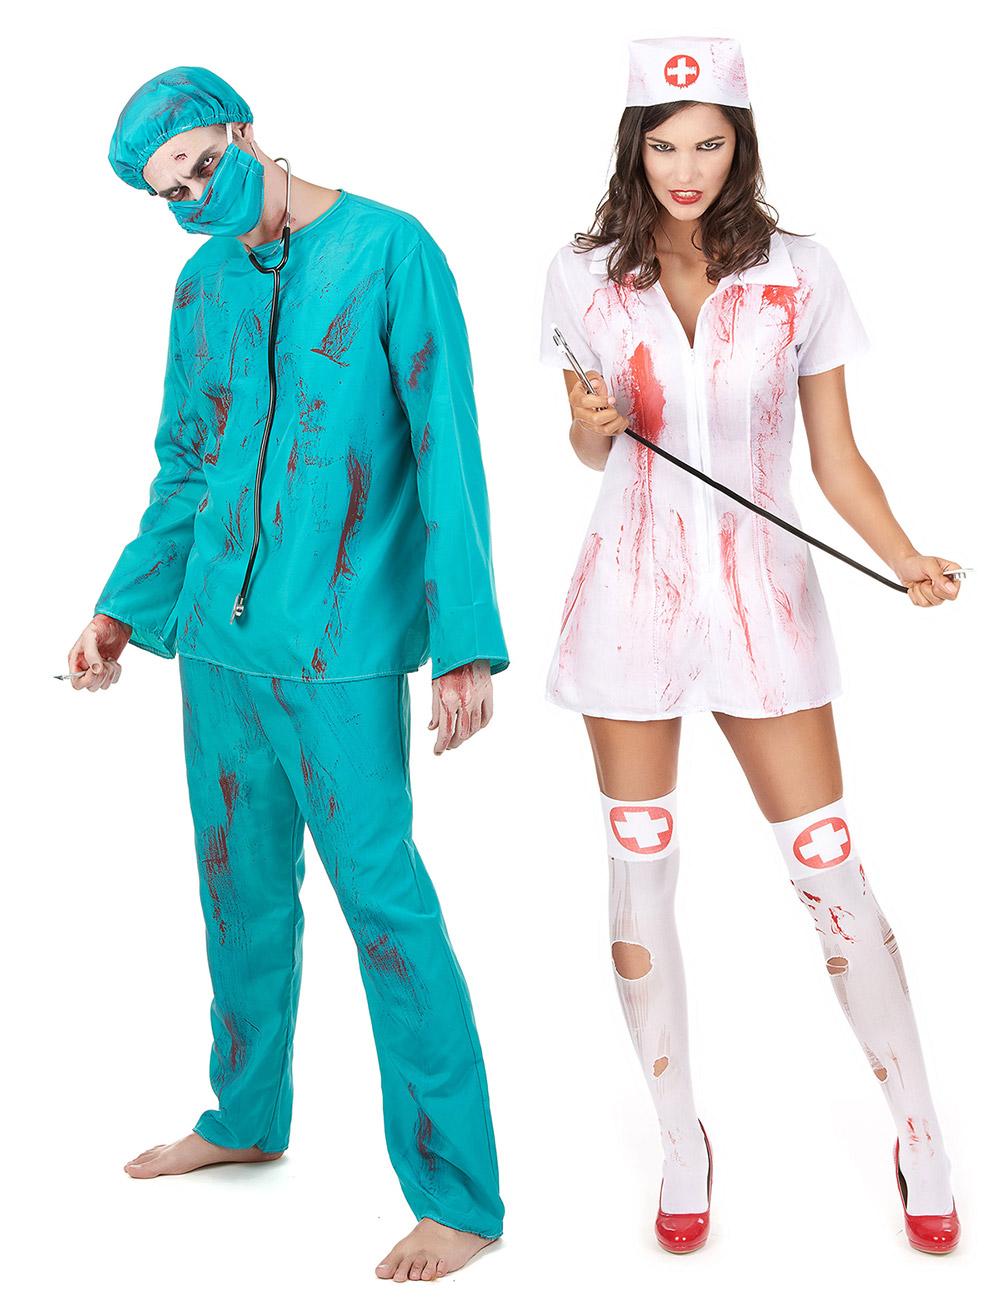 achat costume halloween laval